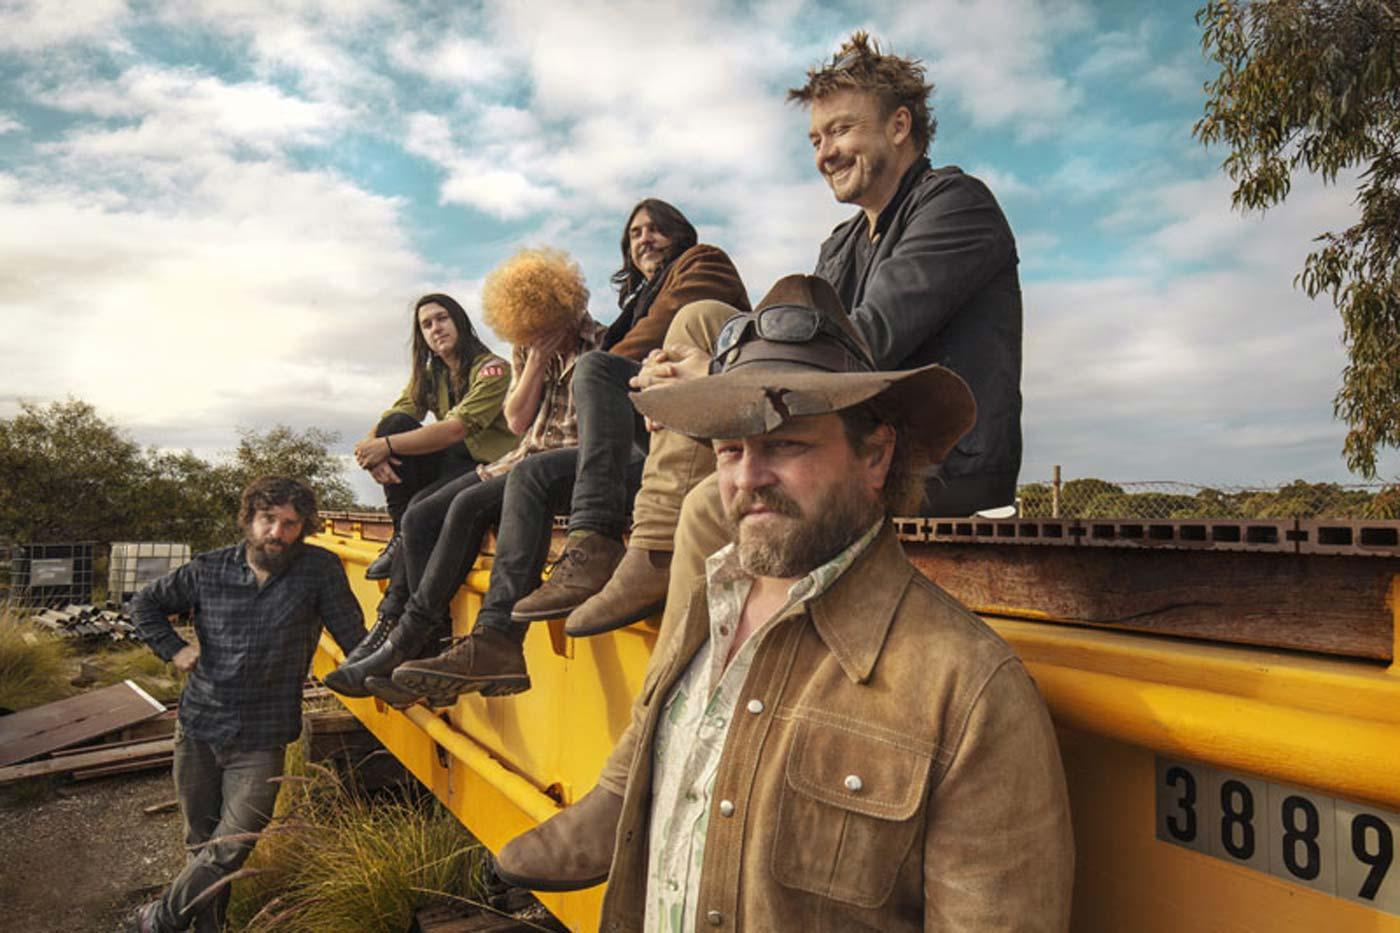 Los australianos The Kill Devil Hills en fecha exclusiva en Donostia